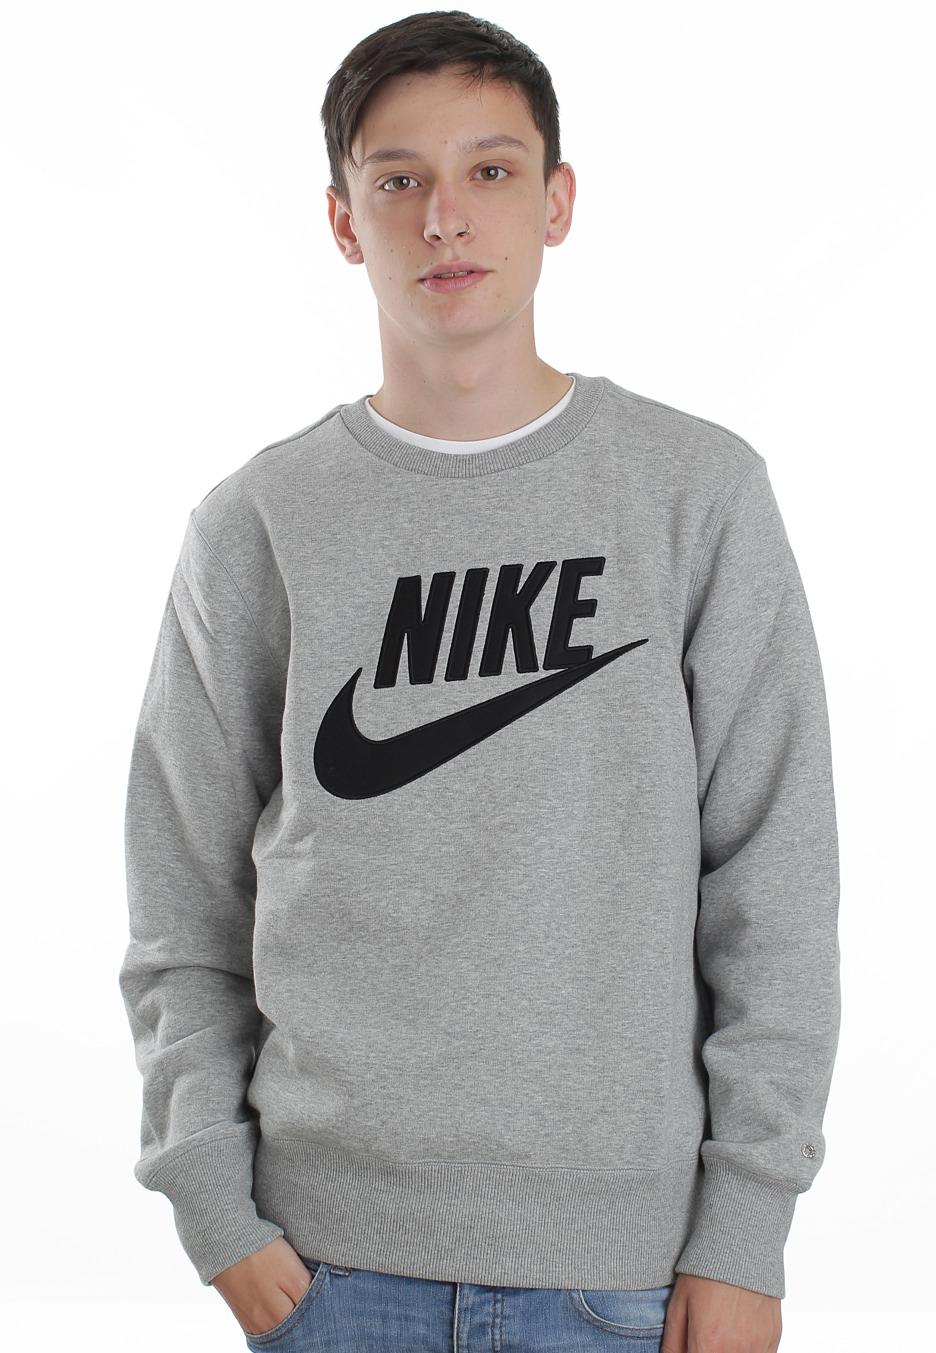 c08d4366898 Nike - PL Brushed Dark Grey Heather/Black - Sweater - Streetwear ...